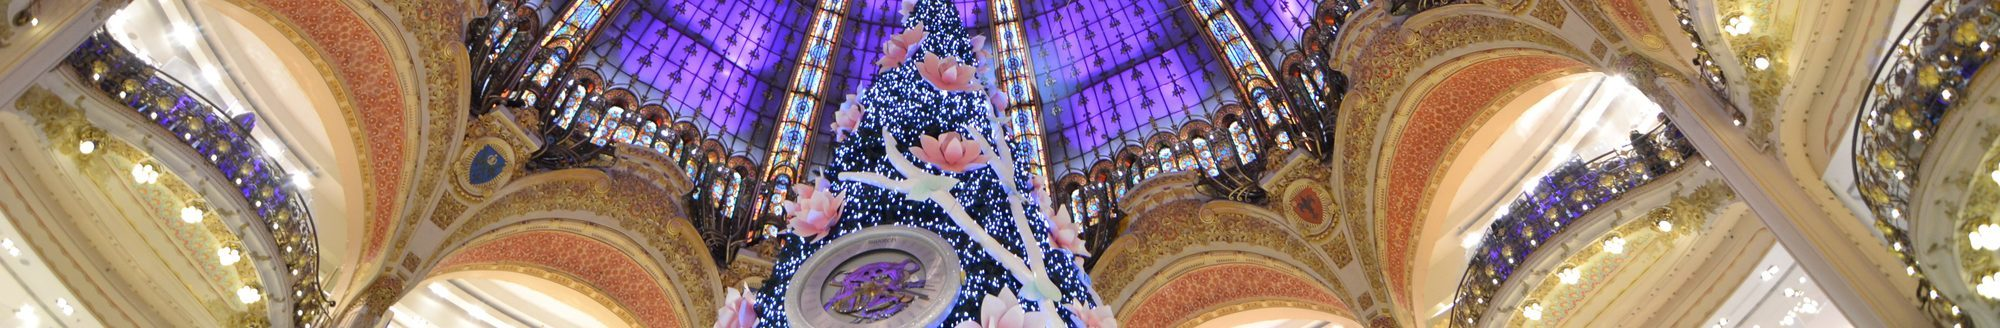 Christmas Eve in Paris